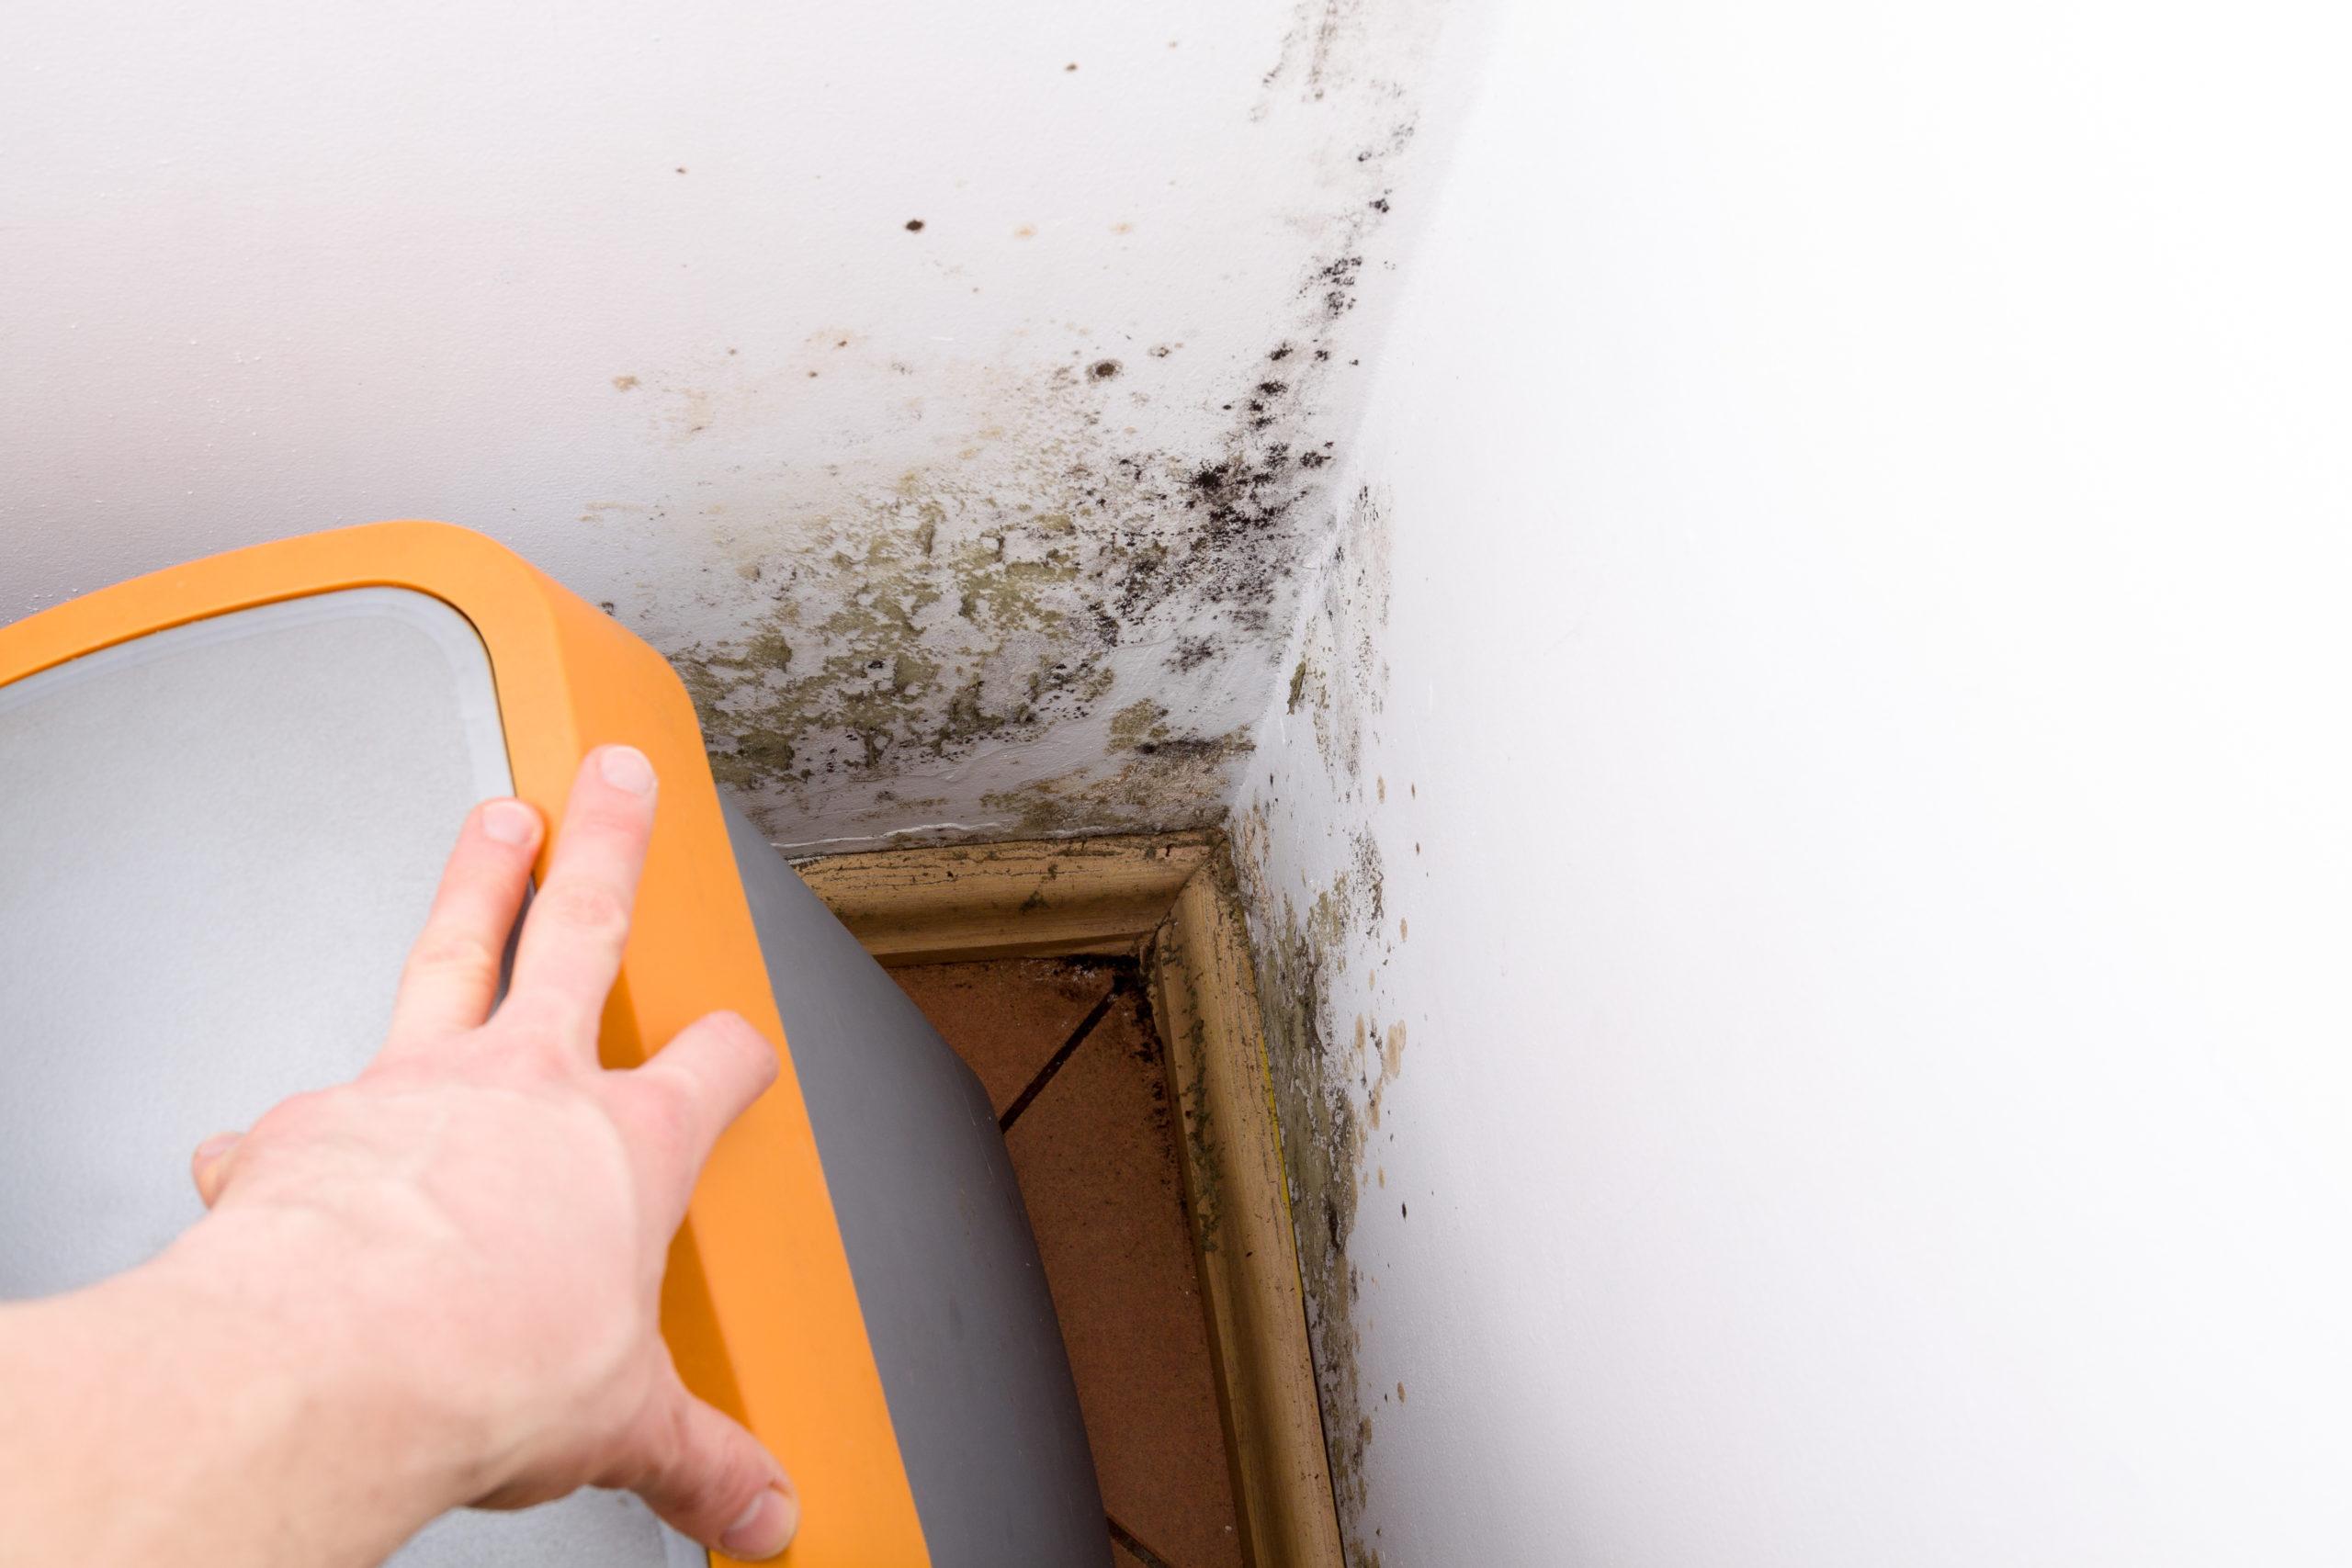 mold on walls of basement